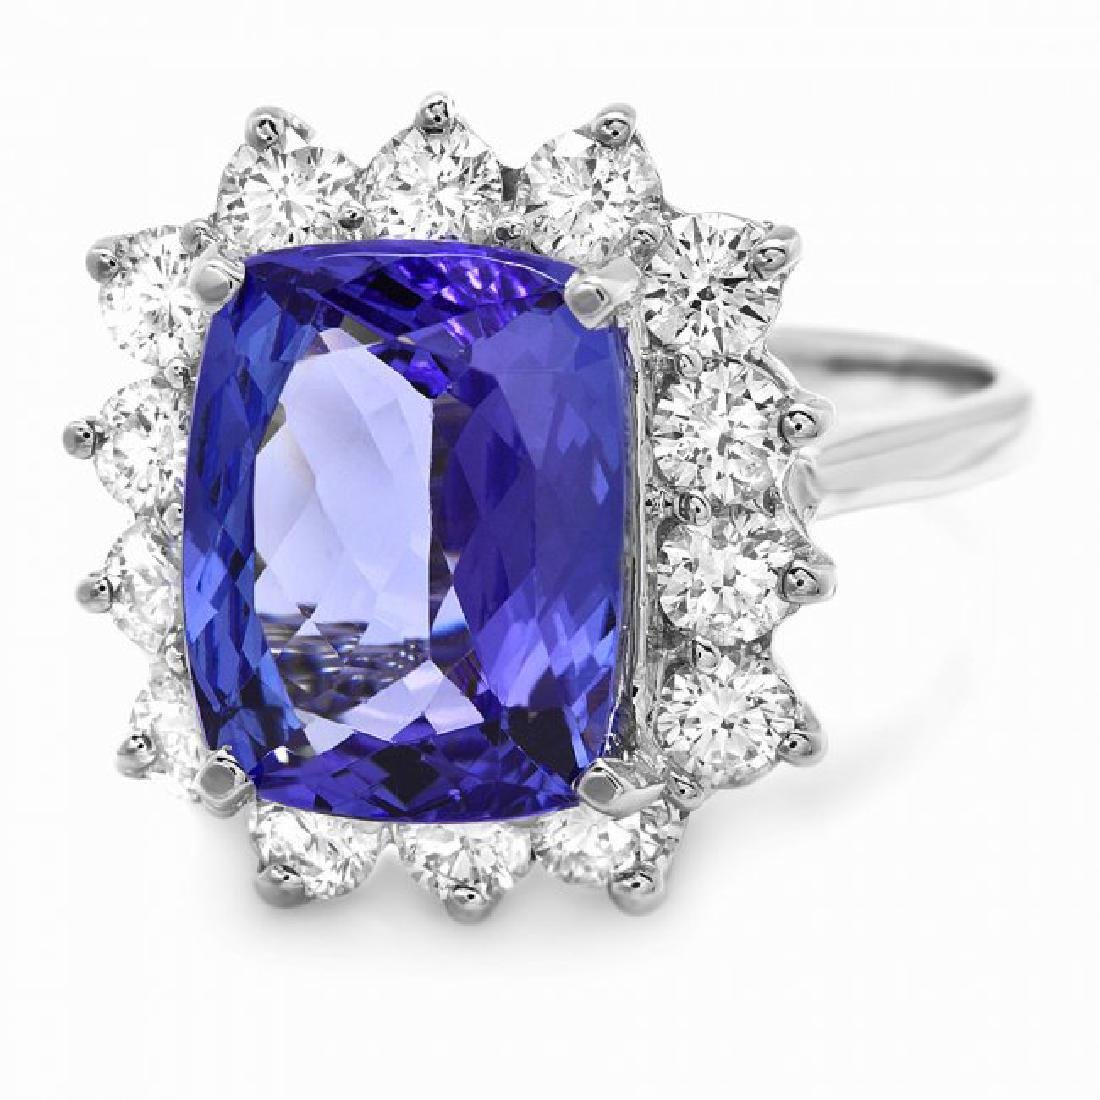 14k Gold 5.00ct Tanzanite 1.20ct Diamond Ring - 2